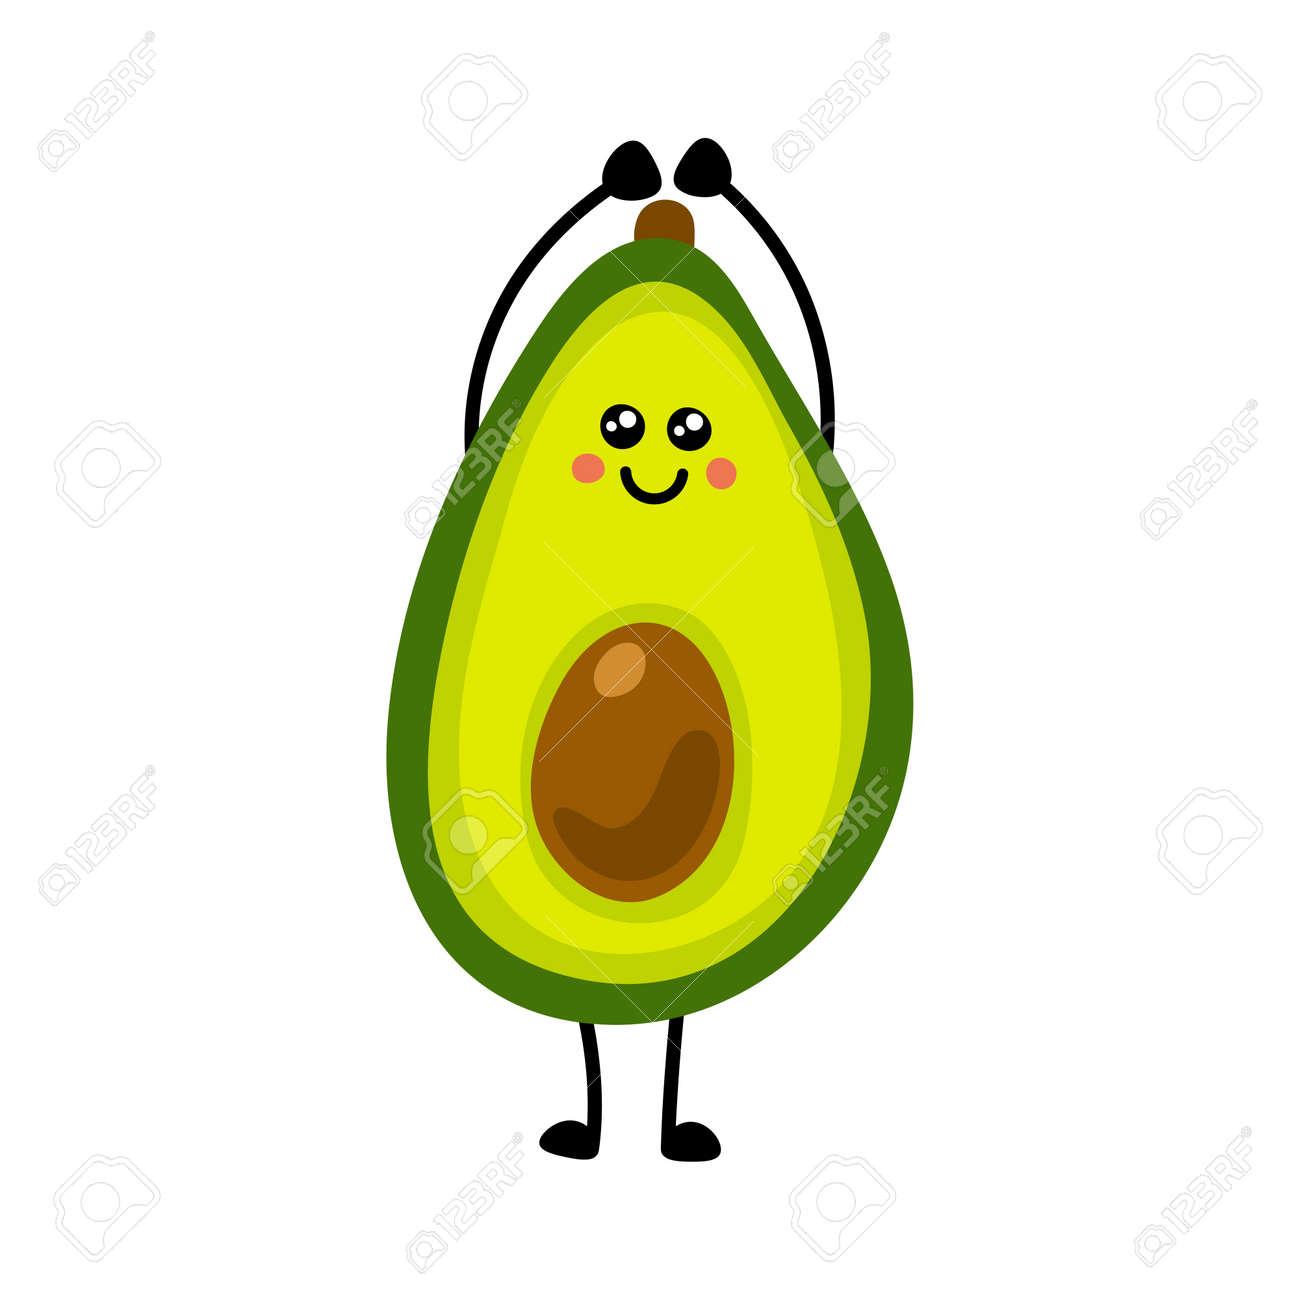 Avocado icon. Flat illustration of avocado vector icon isolated on white background. - 169772083